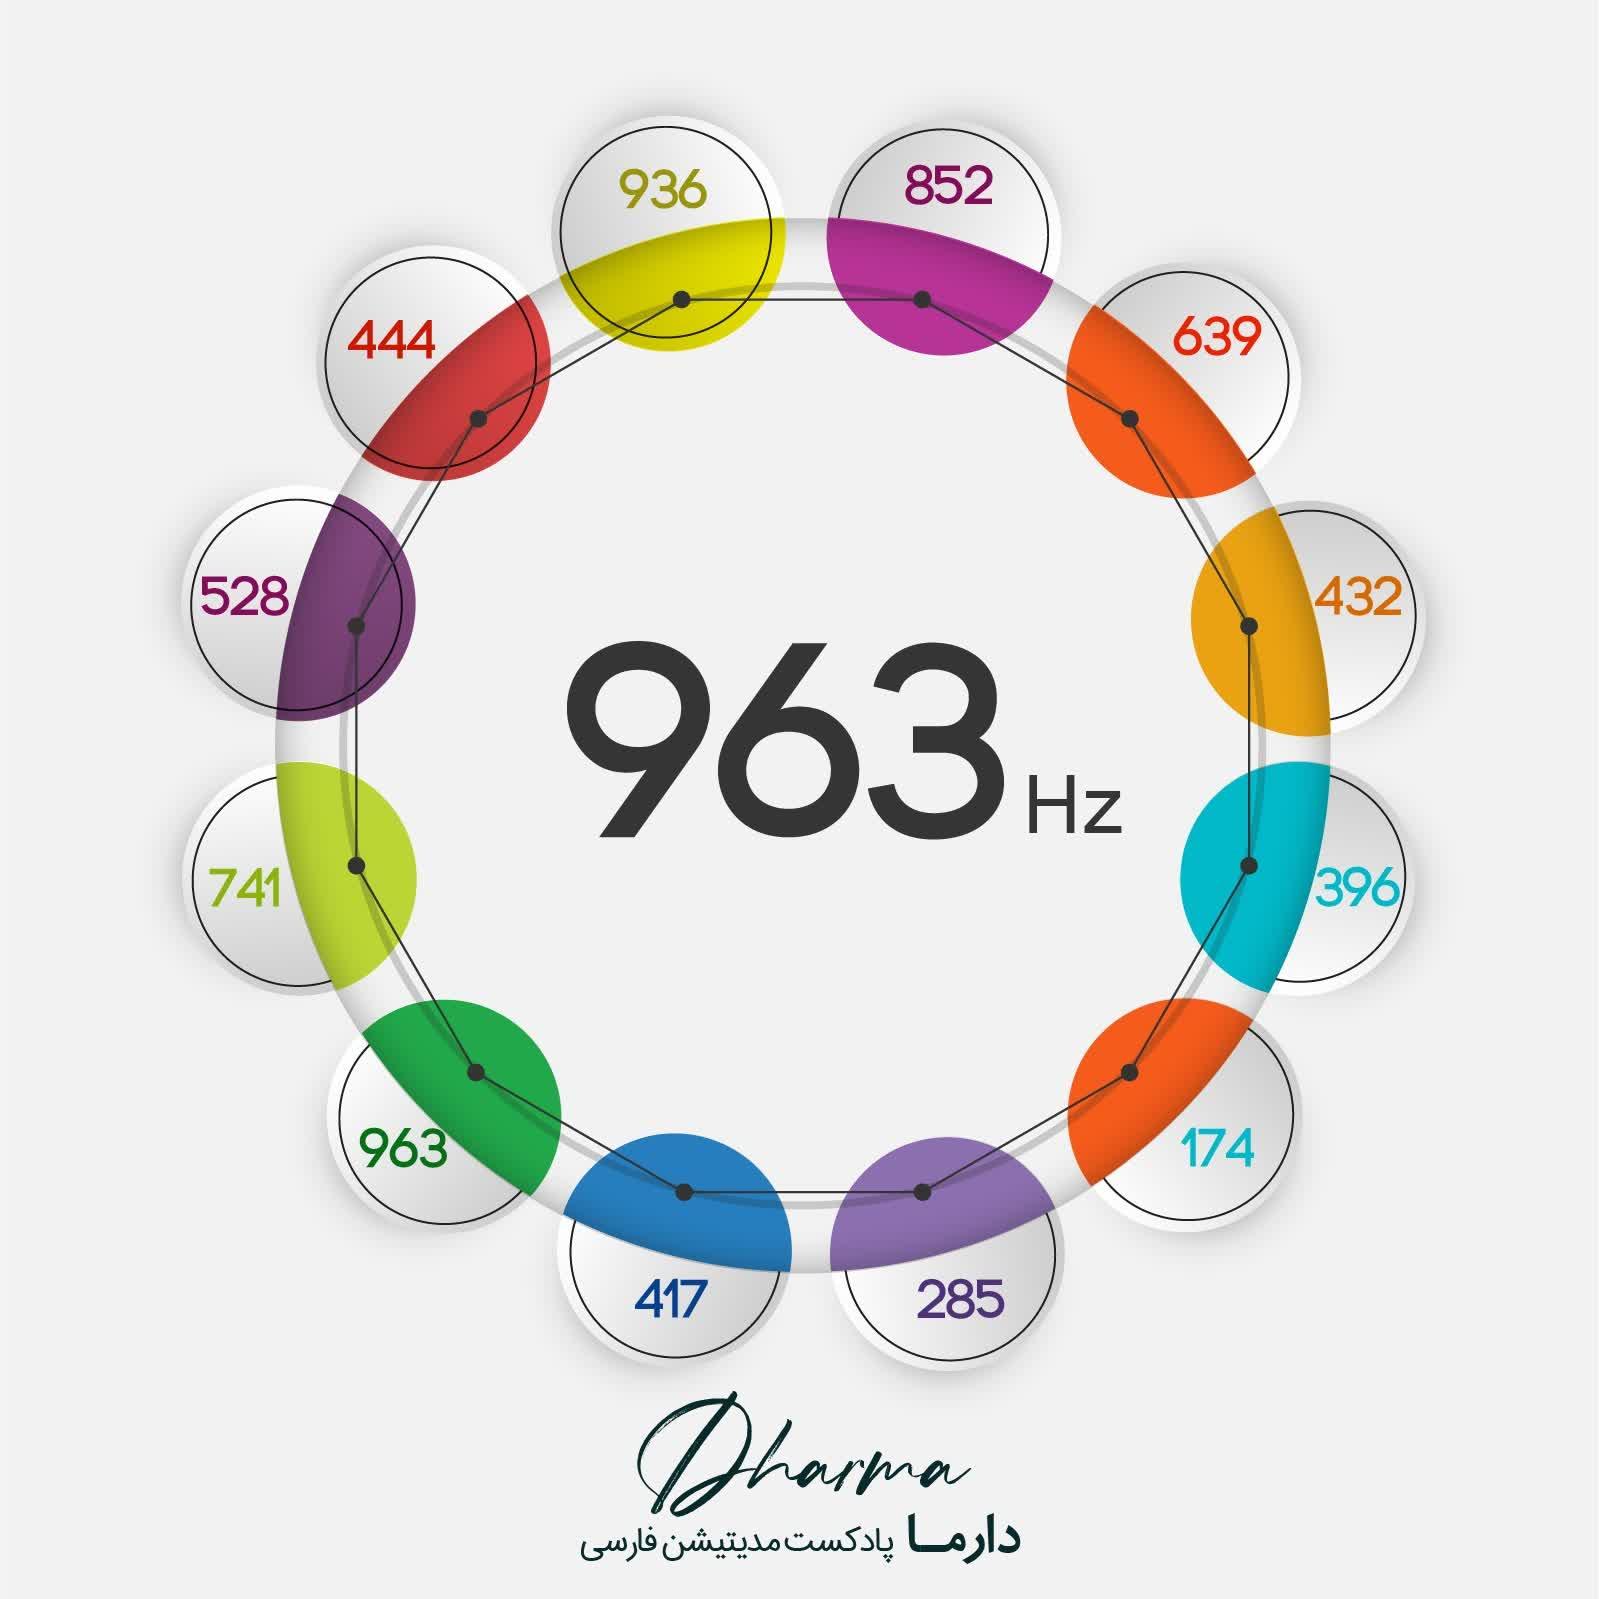 963Hz - فرکانس 963 هرتز